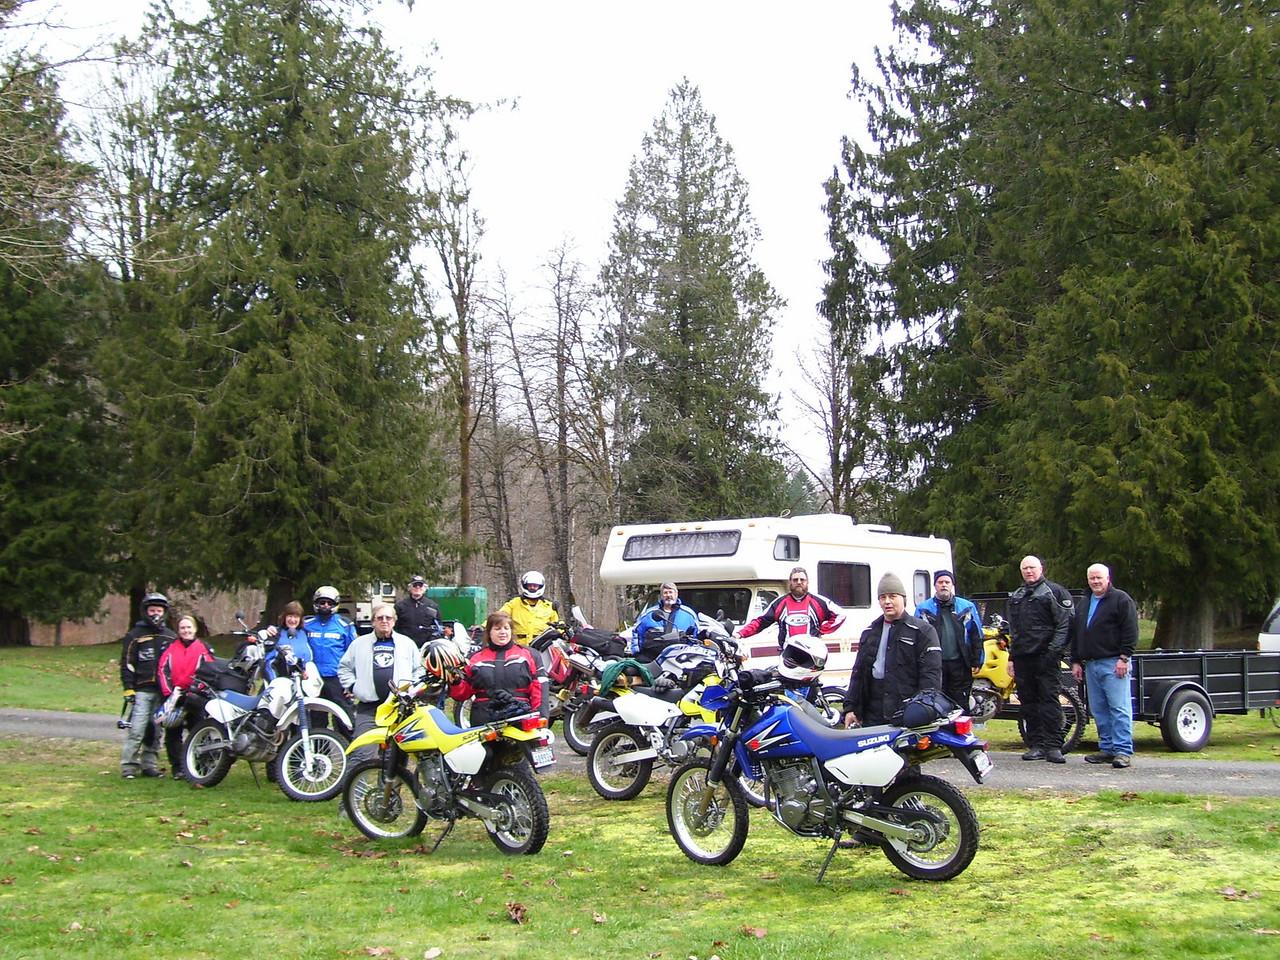 Kris, Tarisa, Sylvia, Lan, Gary, Norm, Cheryl, Dennis, Keith, Tim, Marty, Chris, Dan, Paul, and CJ is taking the picture. 14 riders total for Saturday.